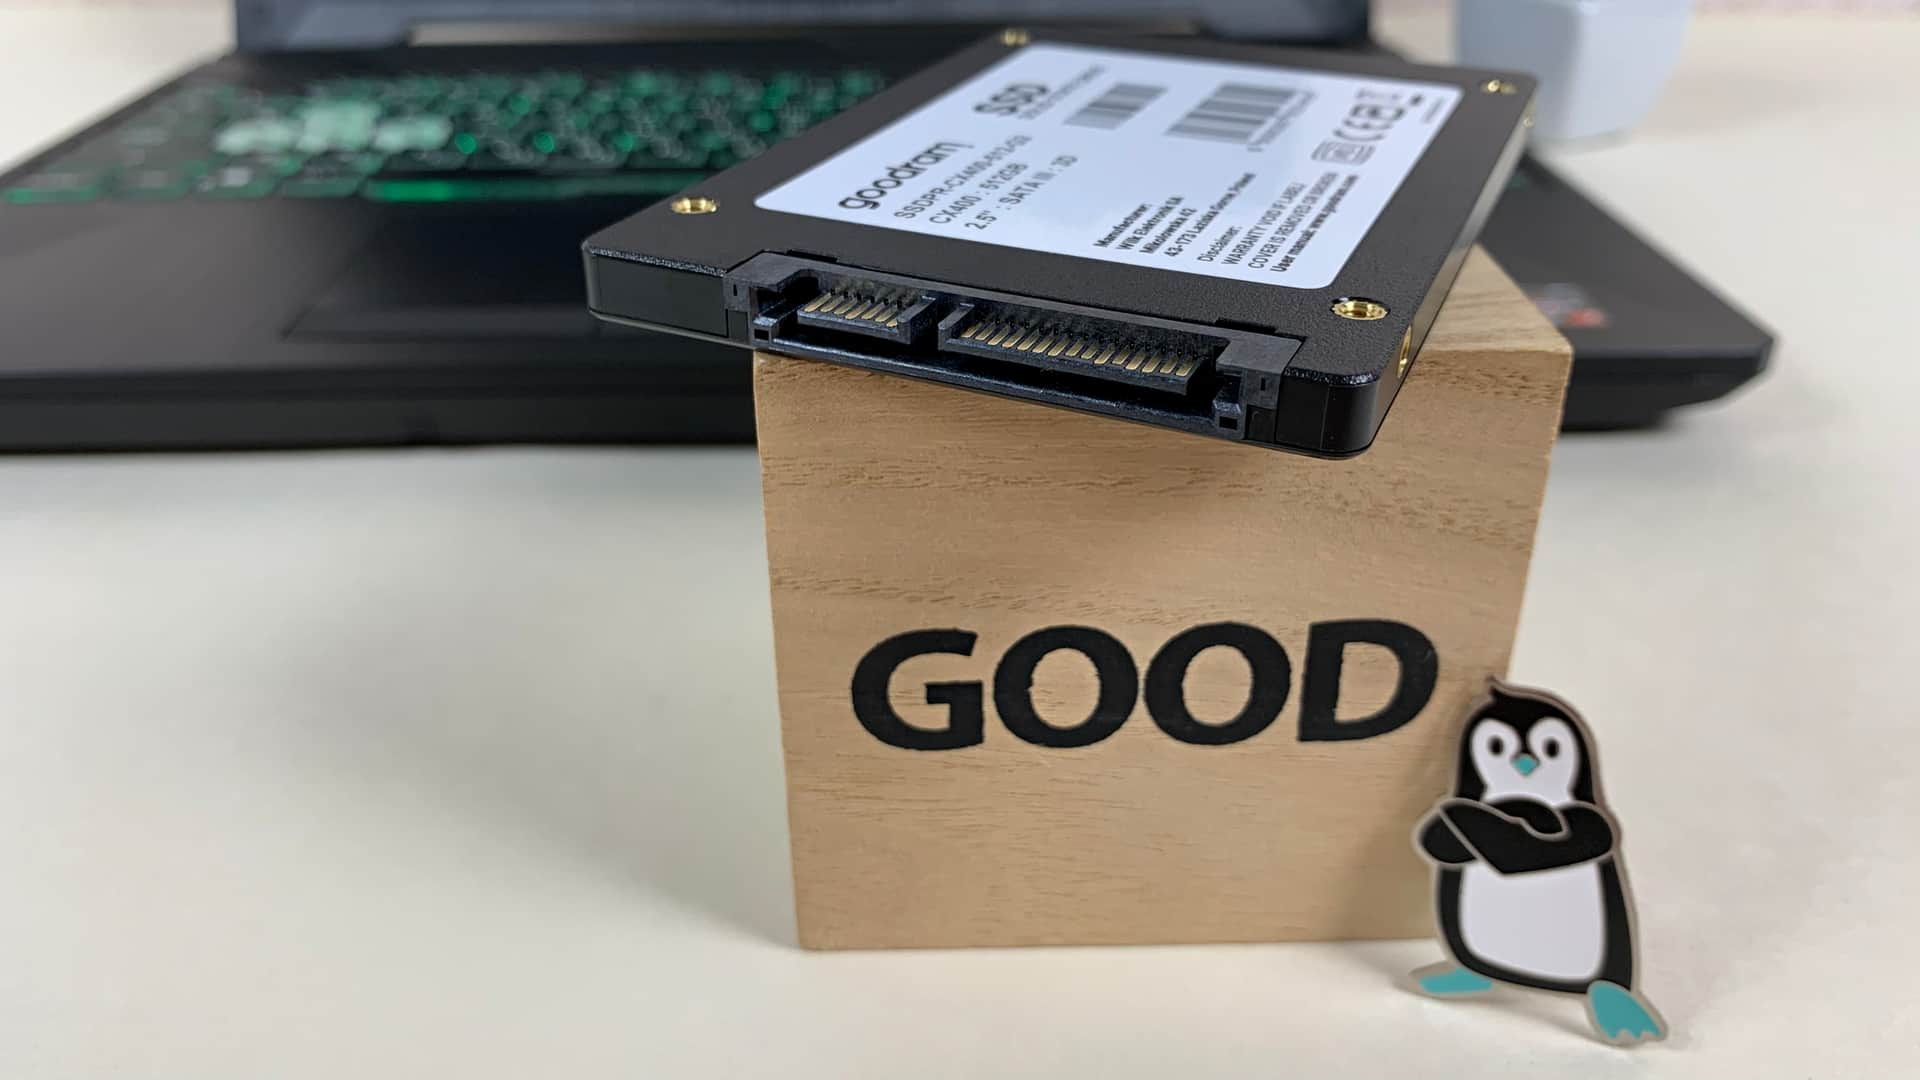 GOODRAM SSD CX400 GEN.2 SATA III